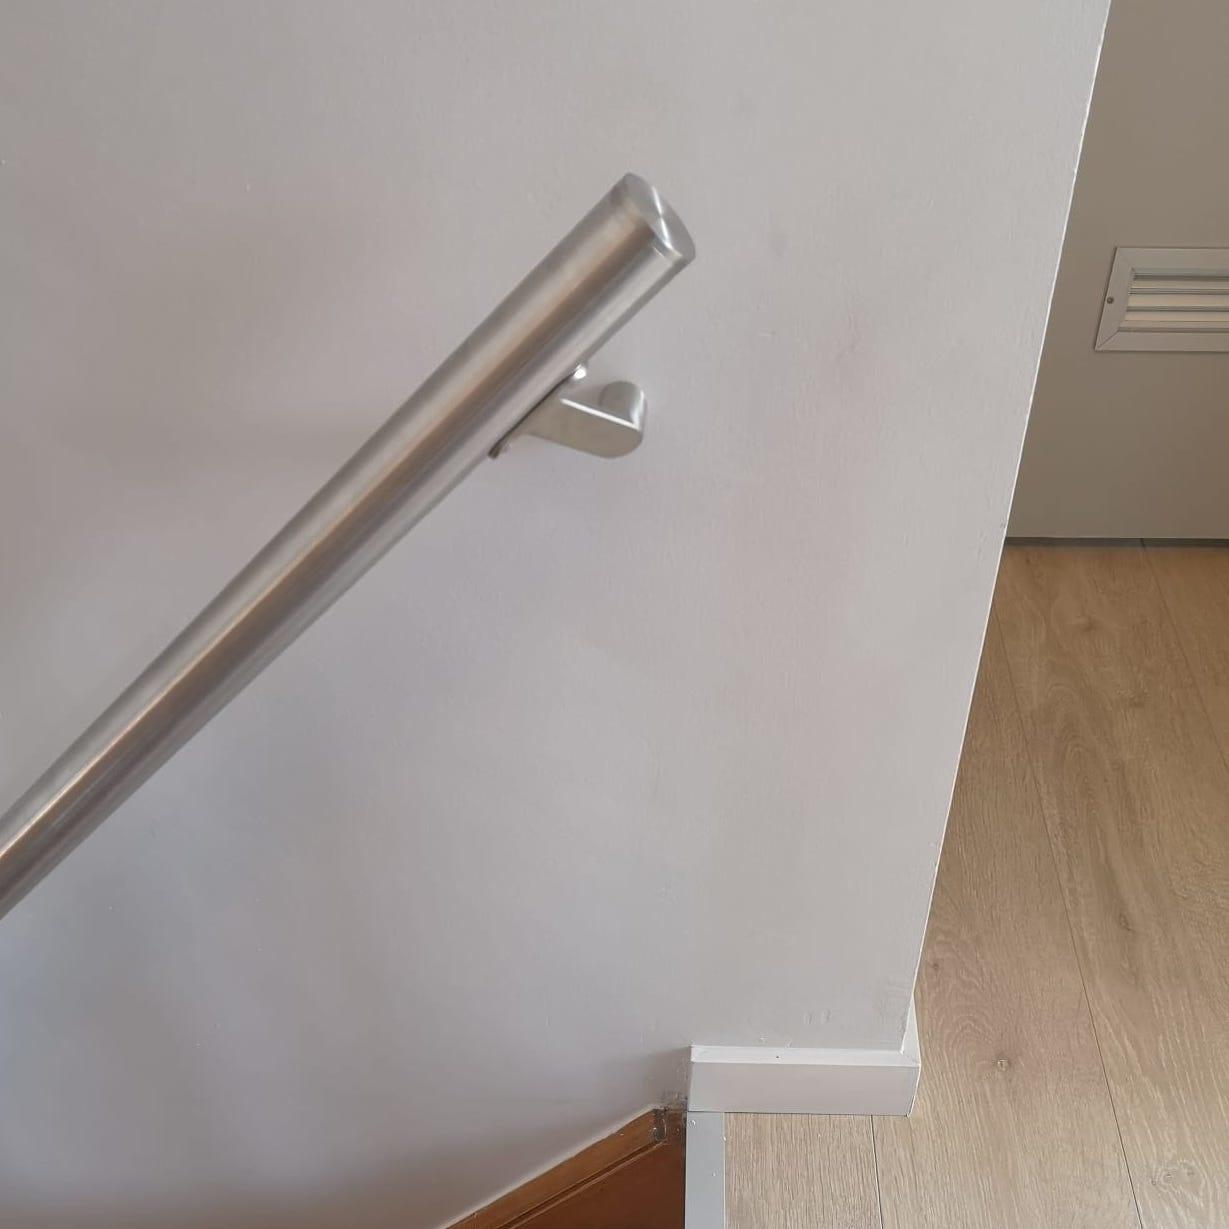 Handlauf Edelstahl rund gebürstet Modell 7 - Runde Edelstahl Treppengeländer - Treppenhandlauf